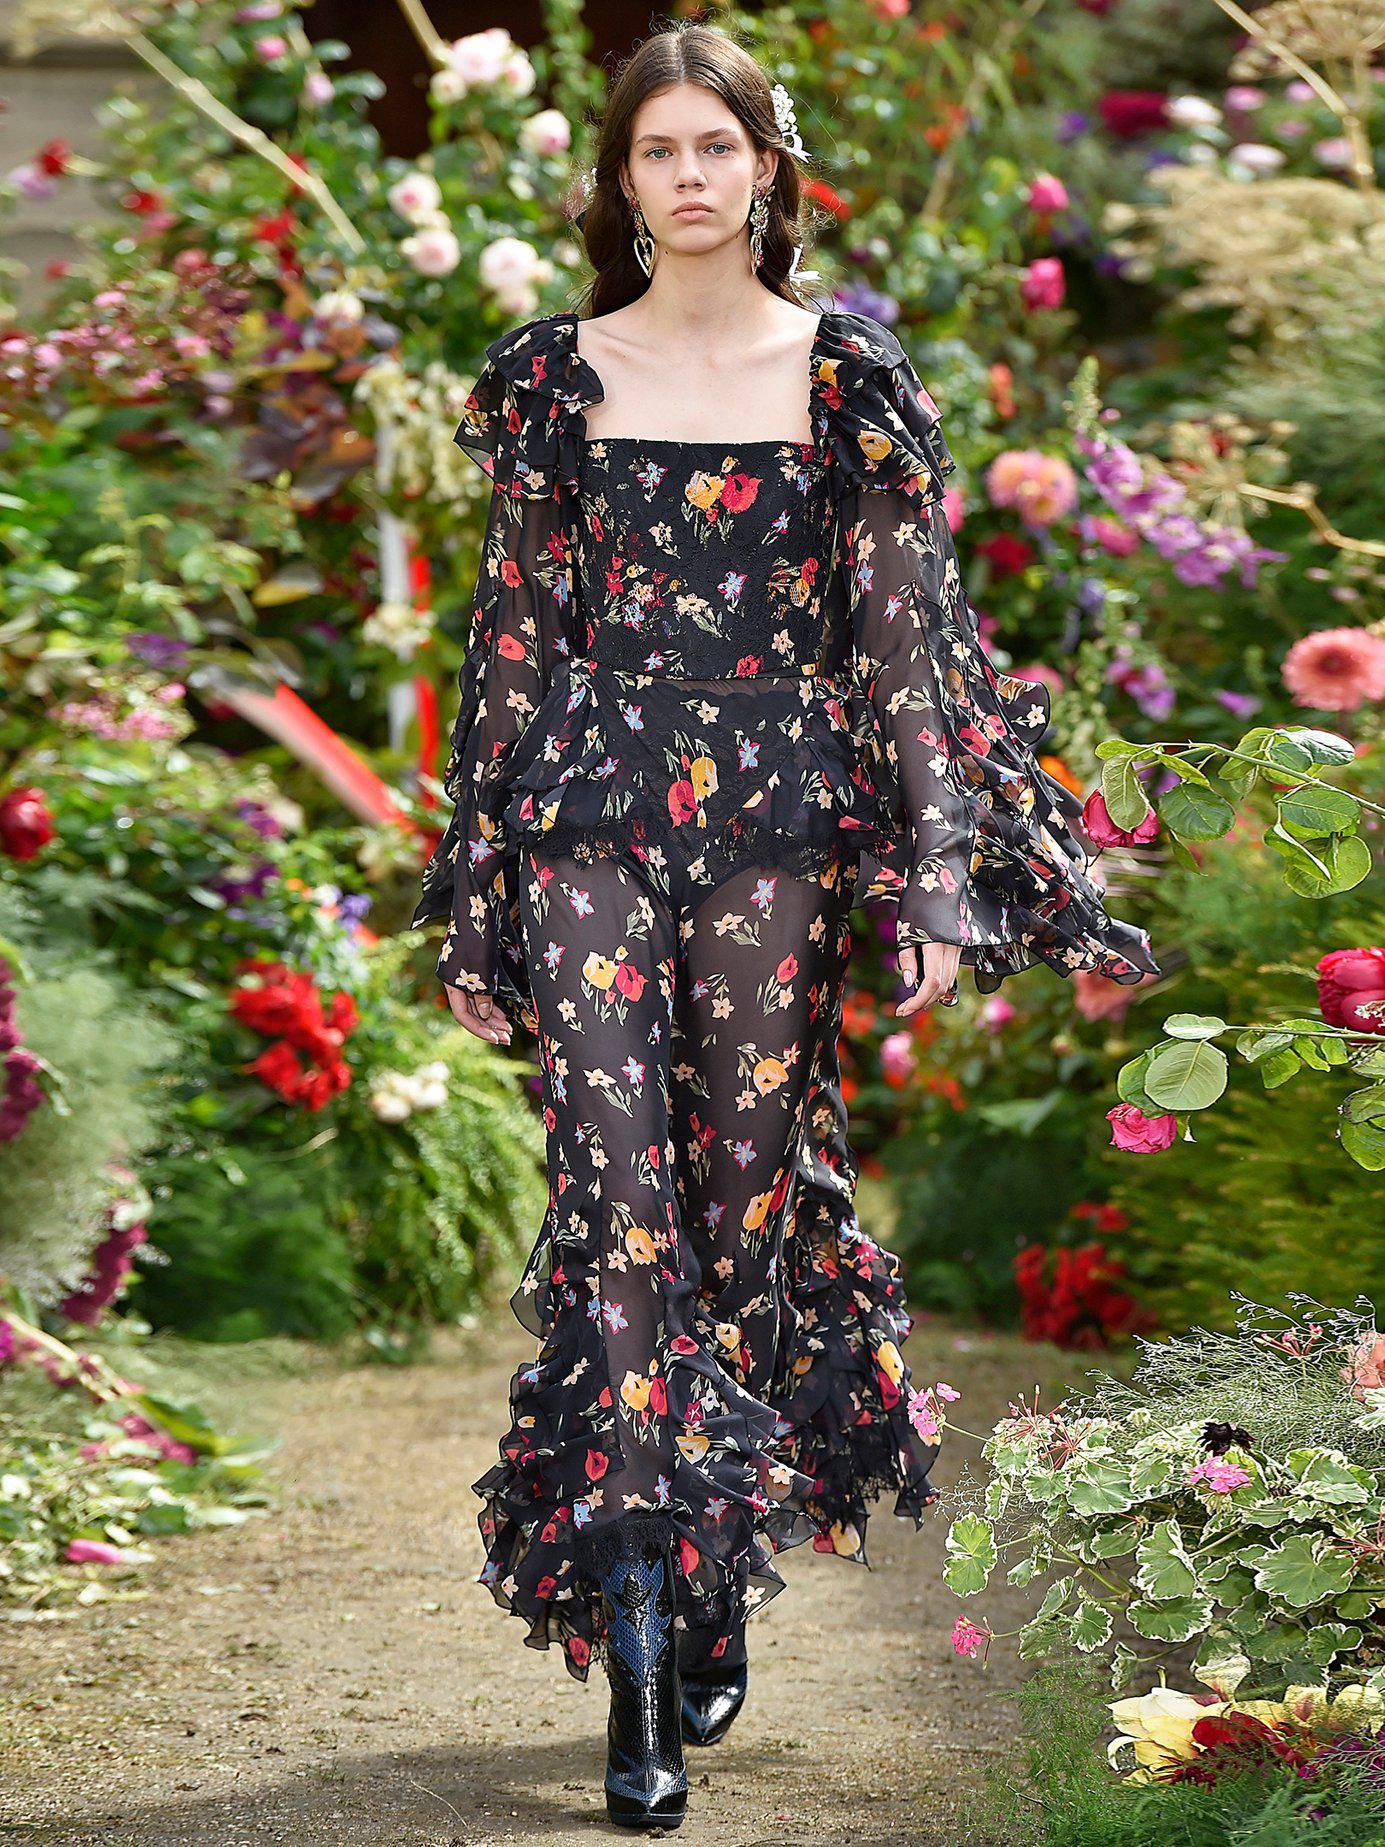 cd136112a03666 Lyst - Rodarte Square Neck Floral Print Silk Blend Blouse in Black